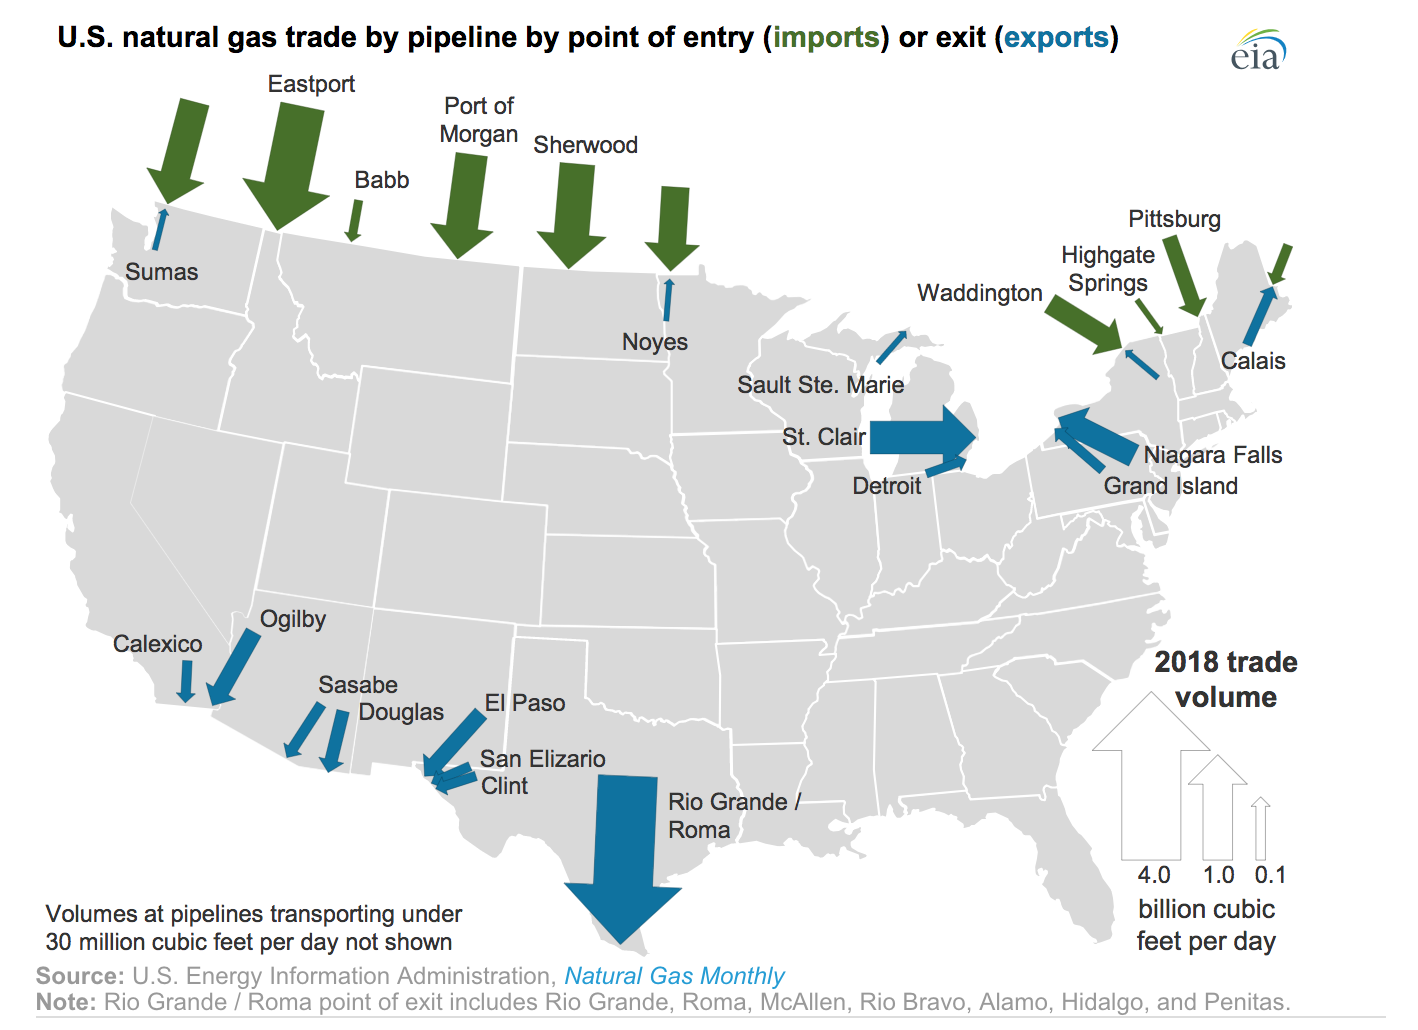 ng-pipelinemap.png